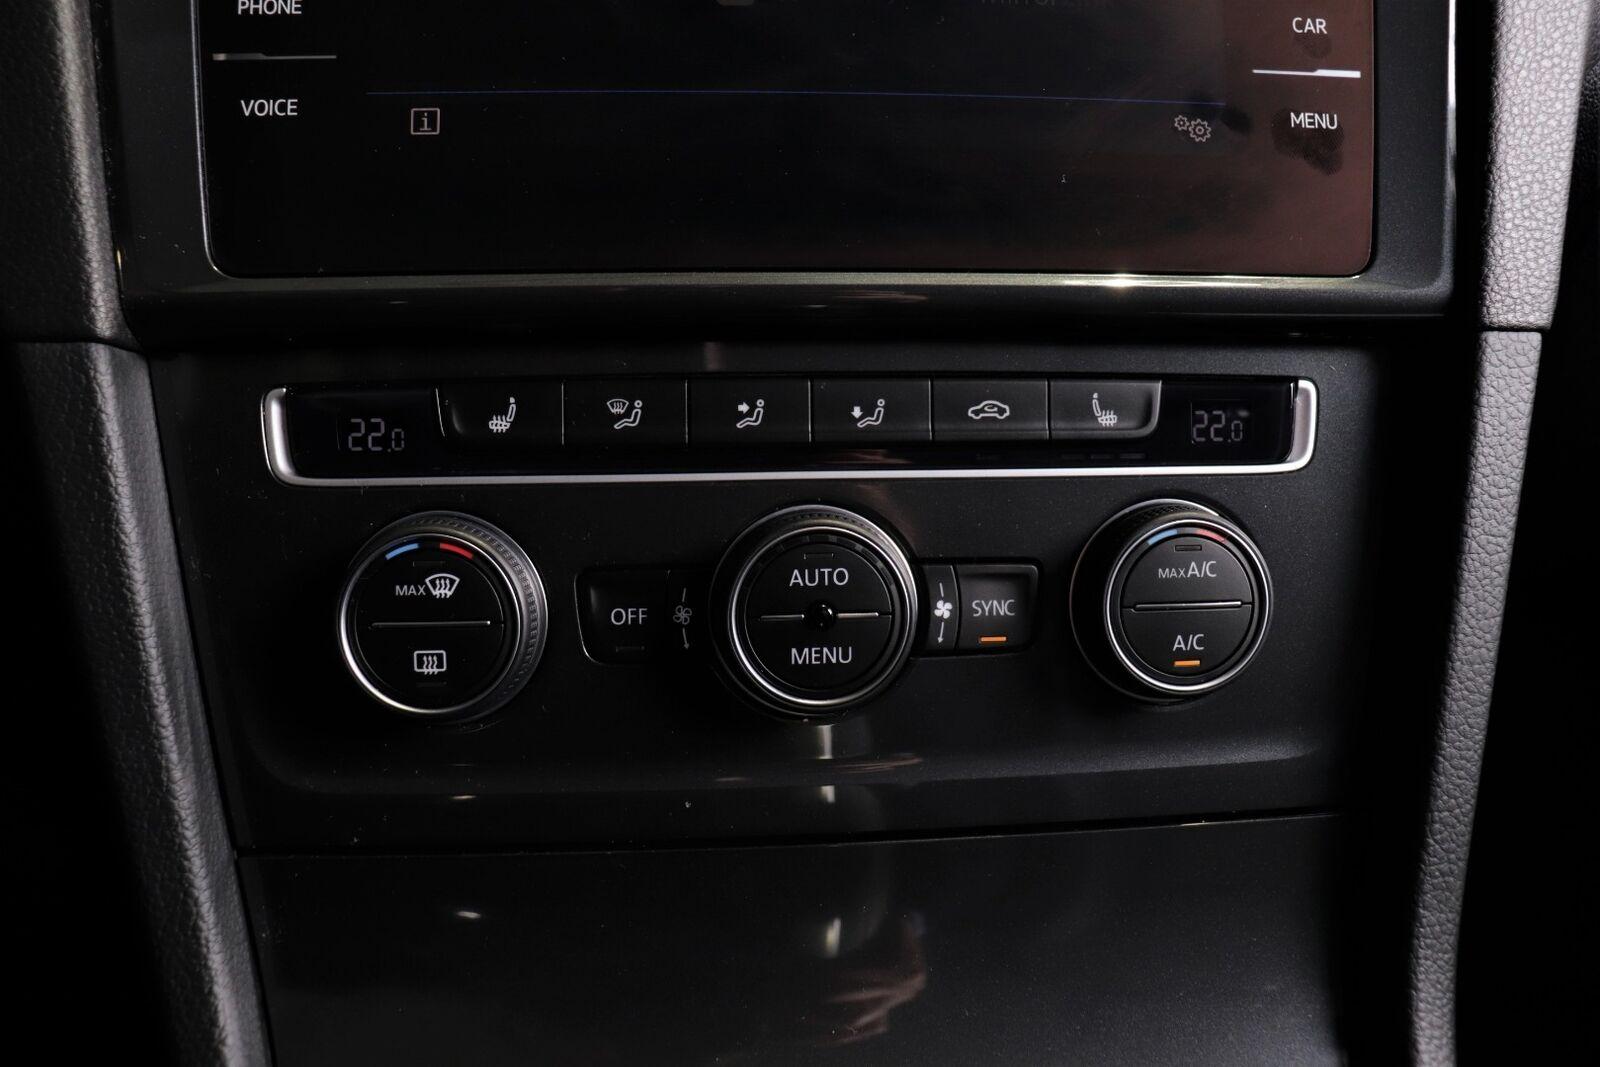 VW Golf VII TDi 150 Connect DSG